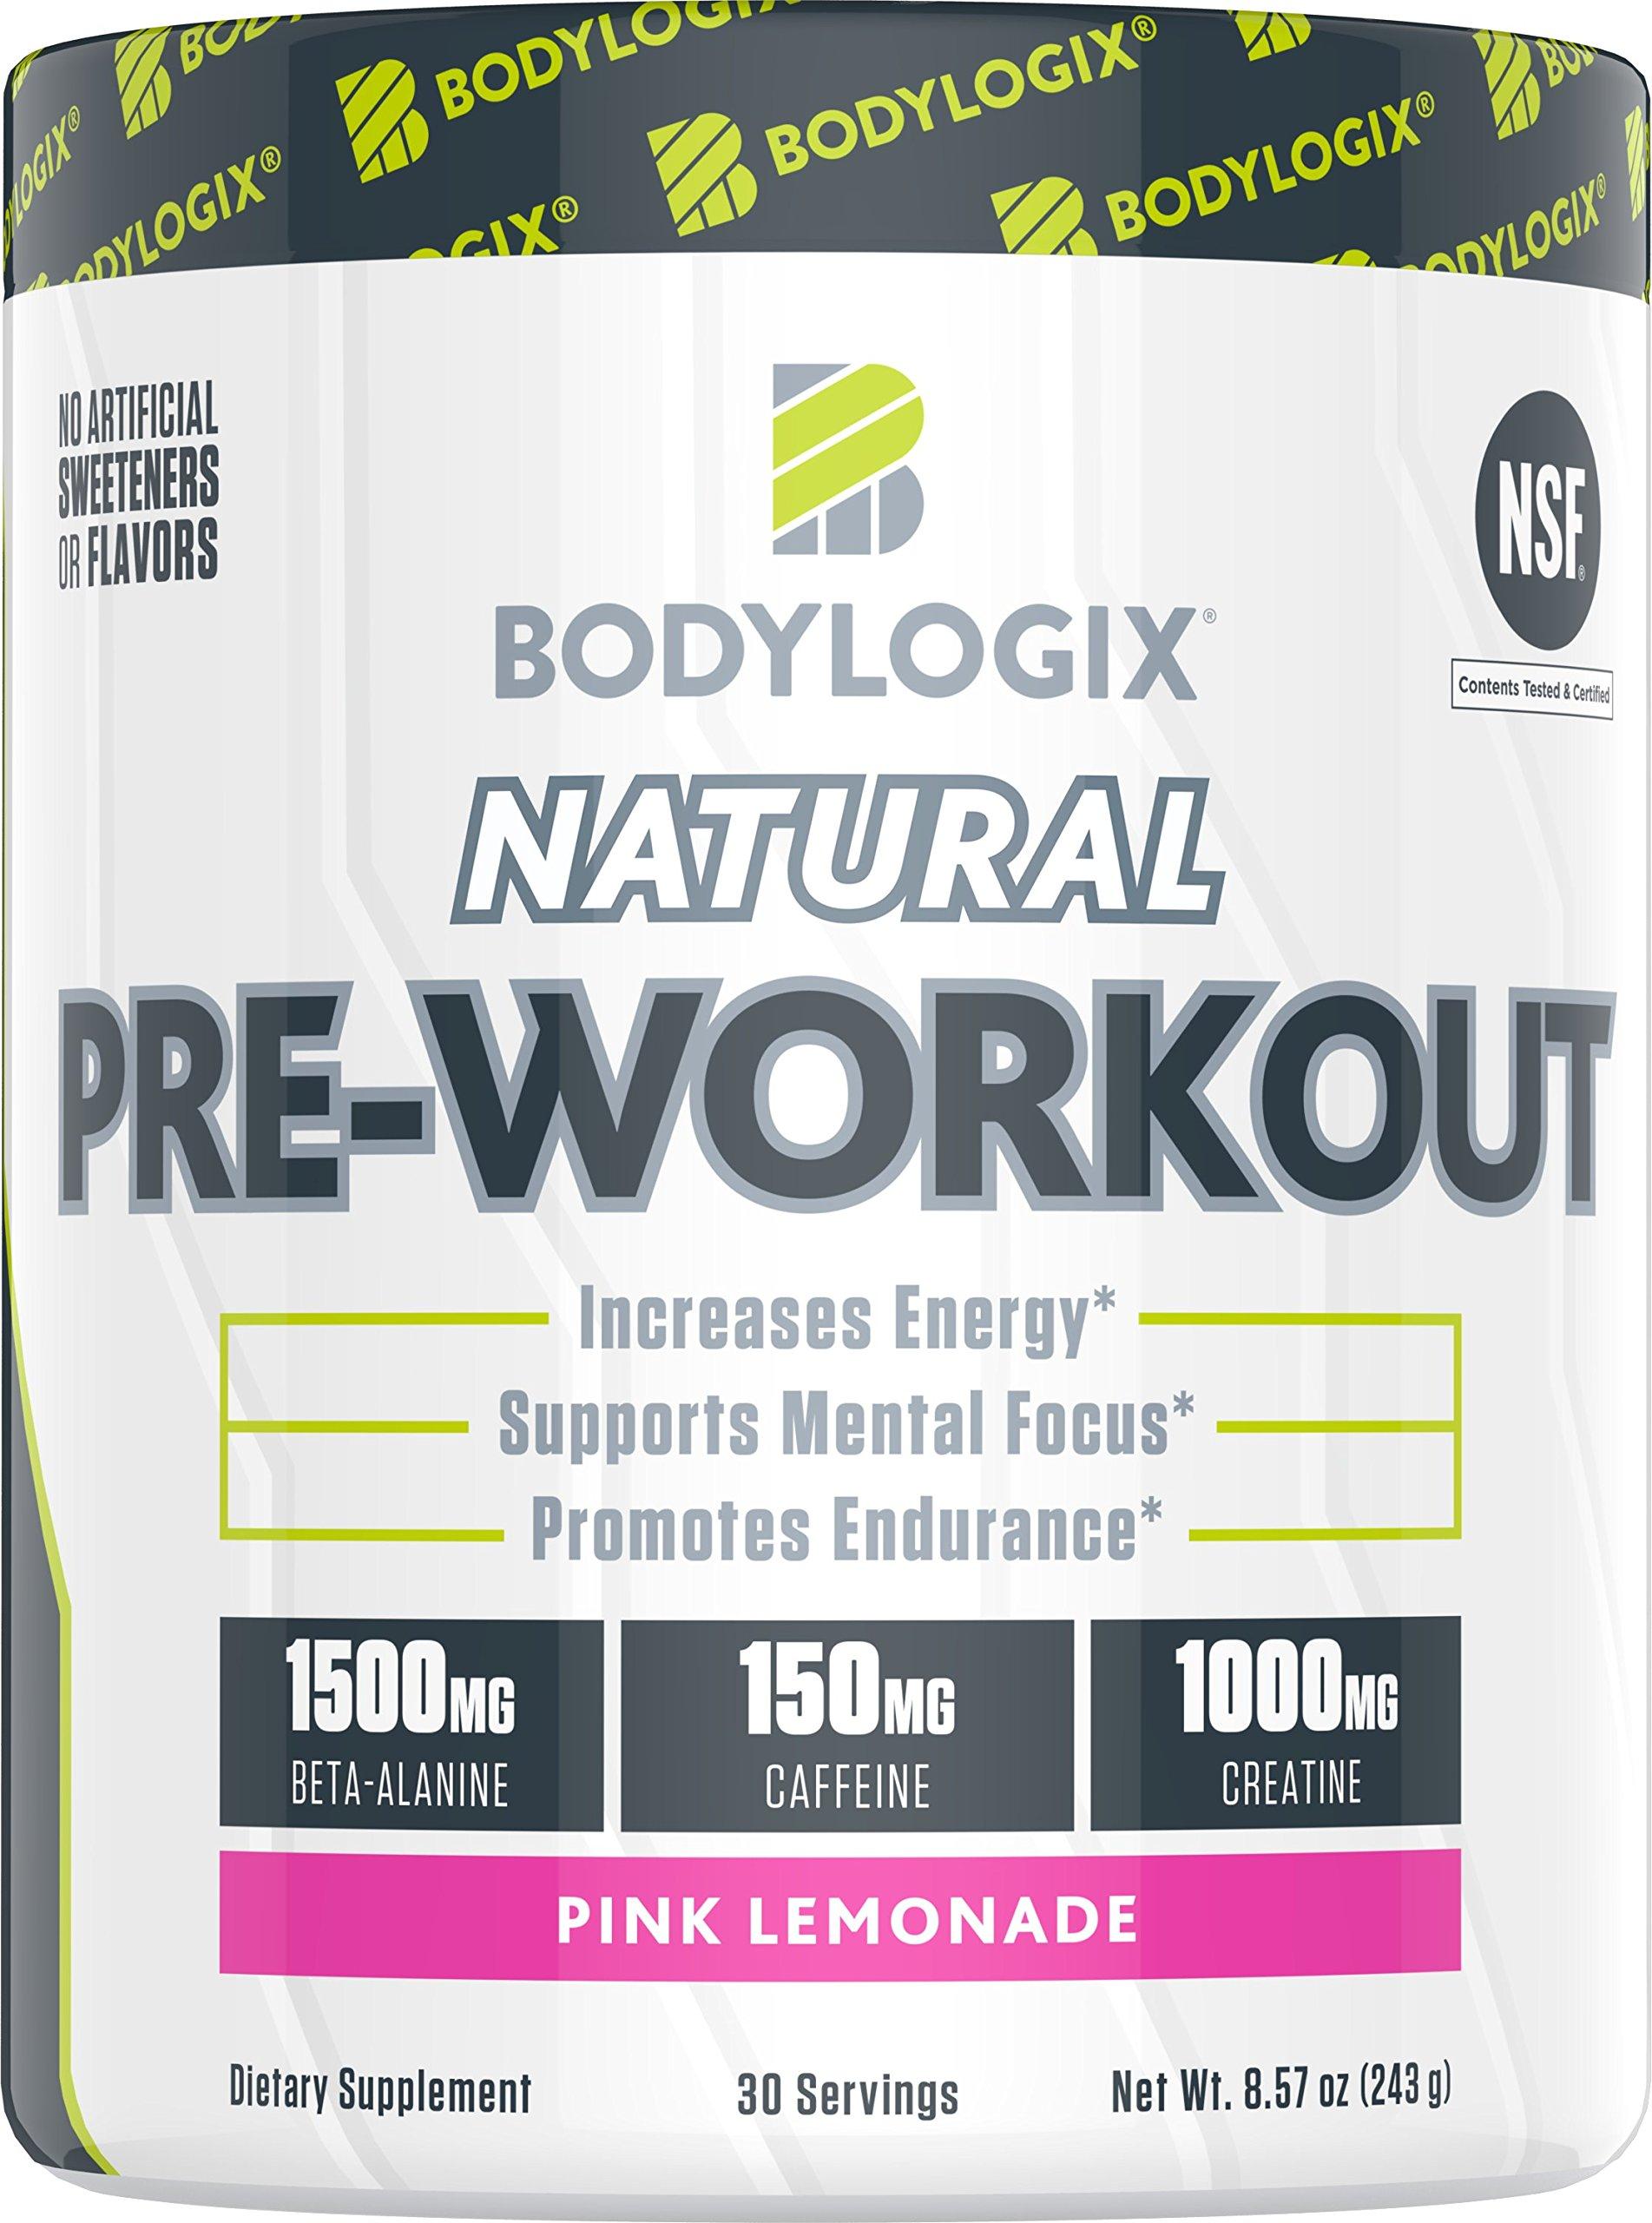 Bodylogix Natural Pre-Workout Powder, NSF Certified, Pink Lemonade, 30 Servings